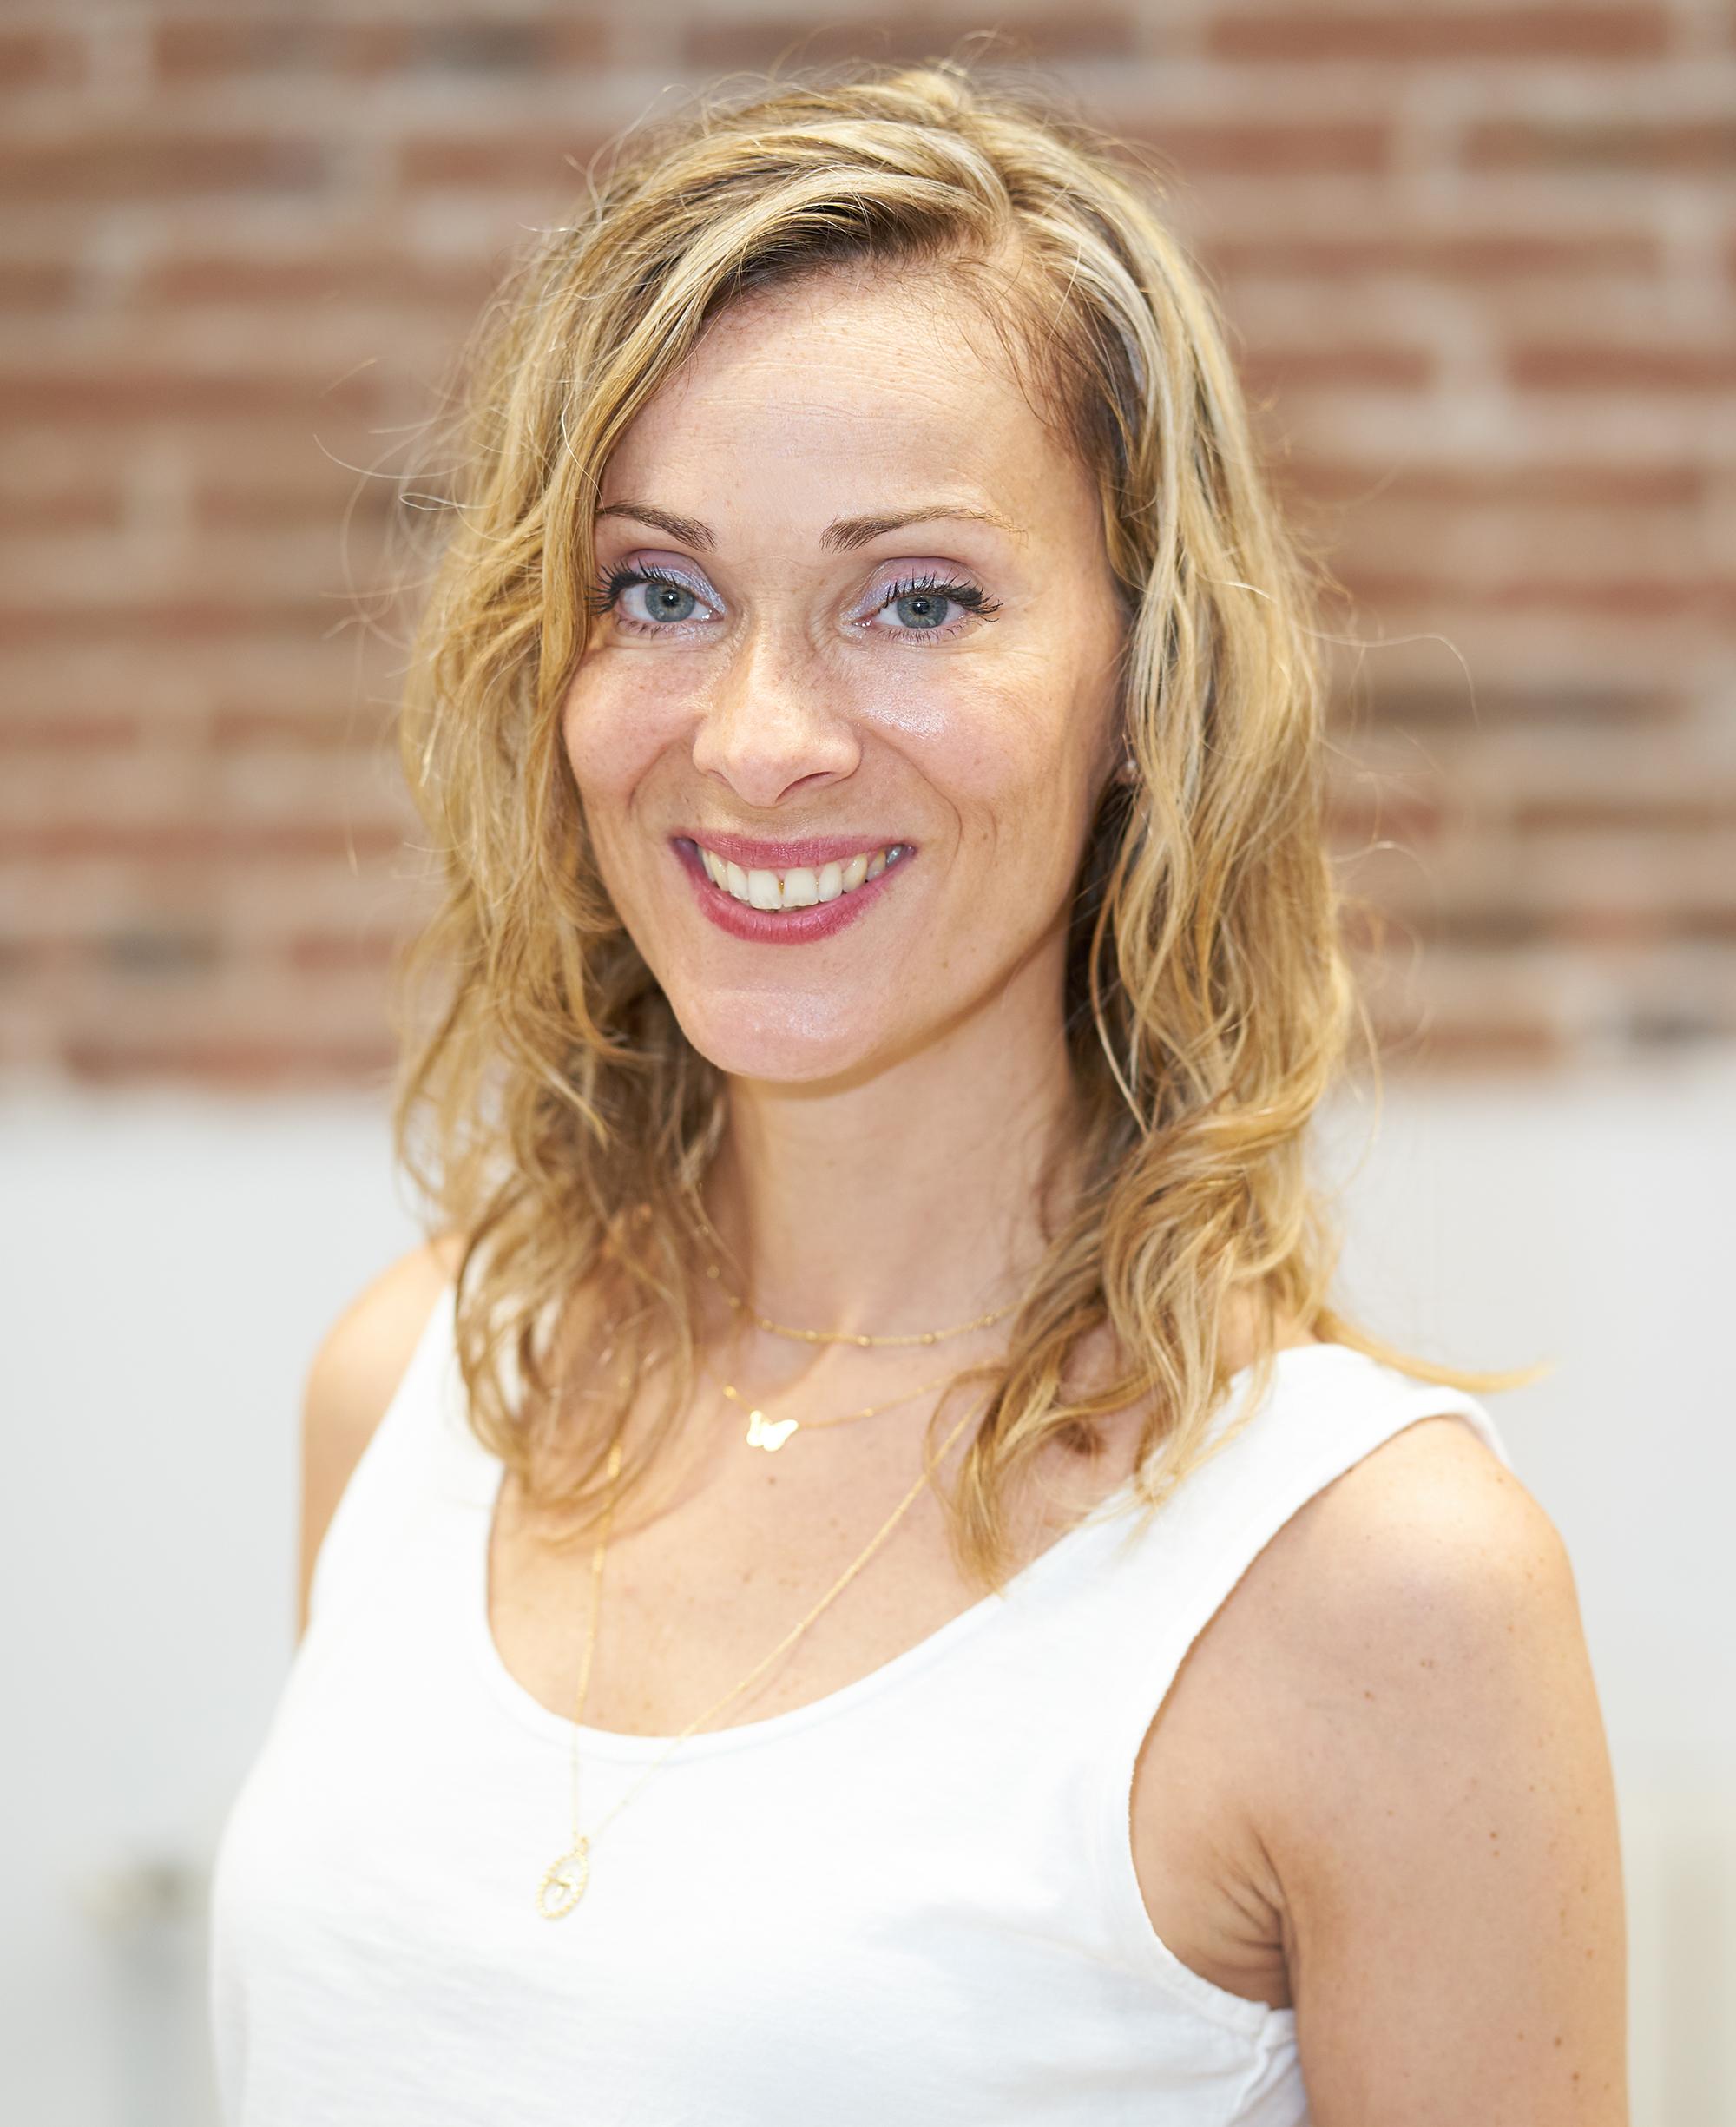 Elodie Guillard